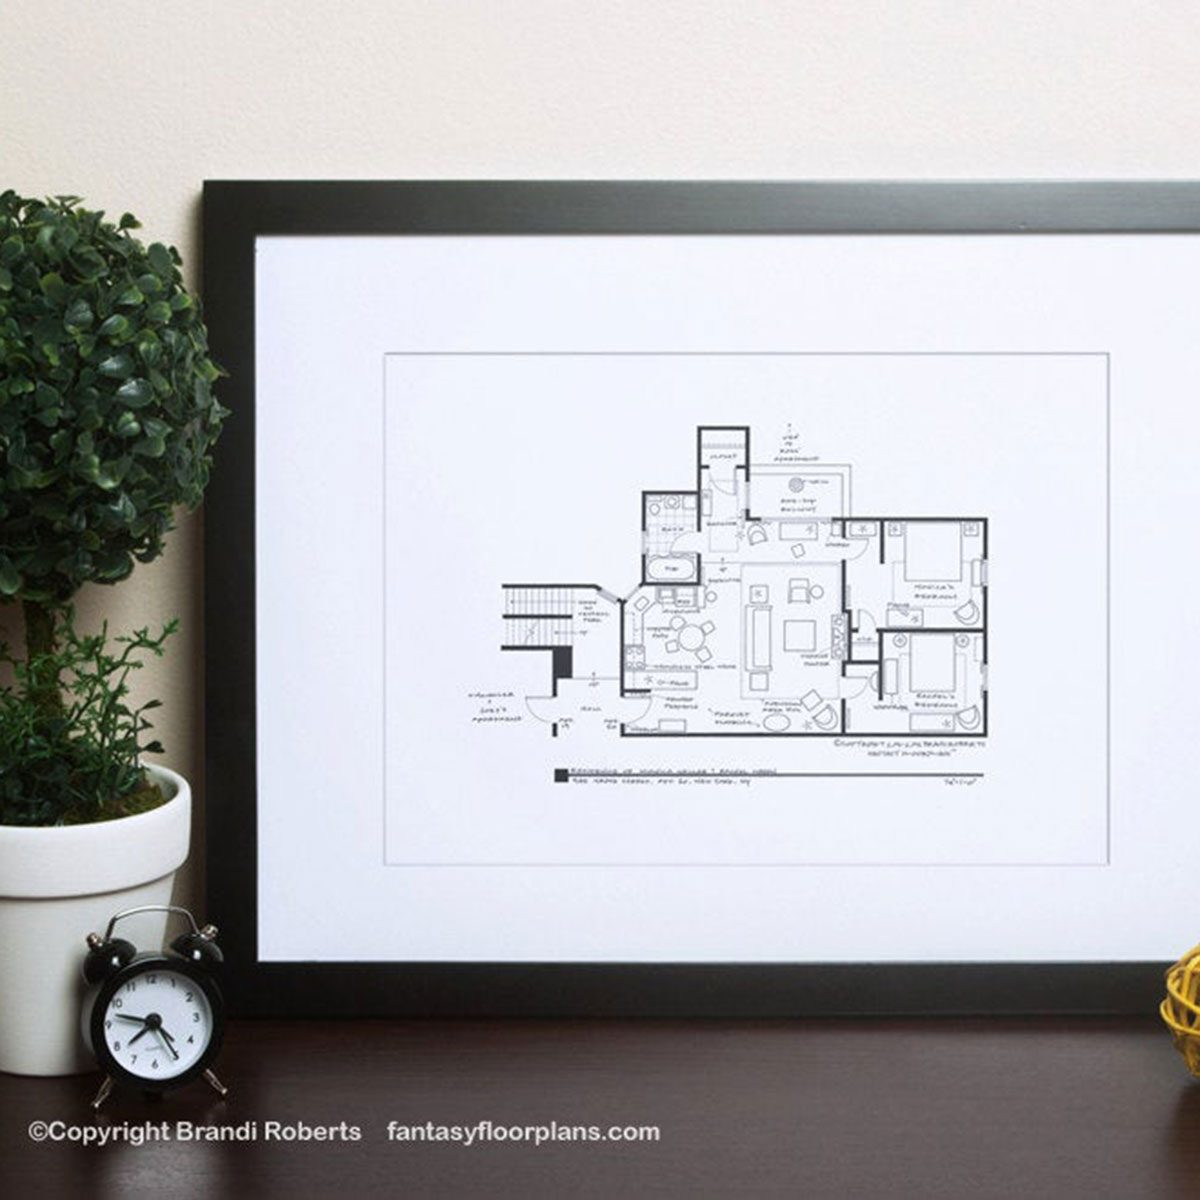 Floor Plan of Monica's Apartment Print